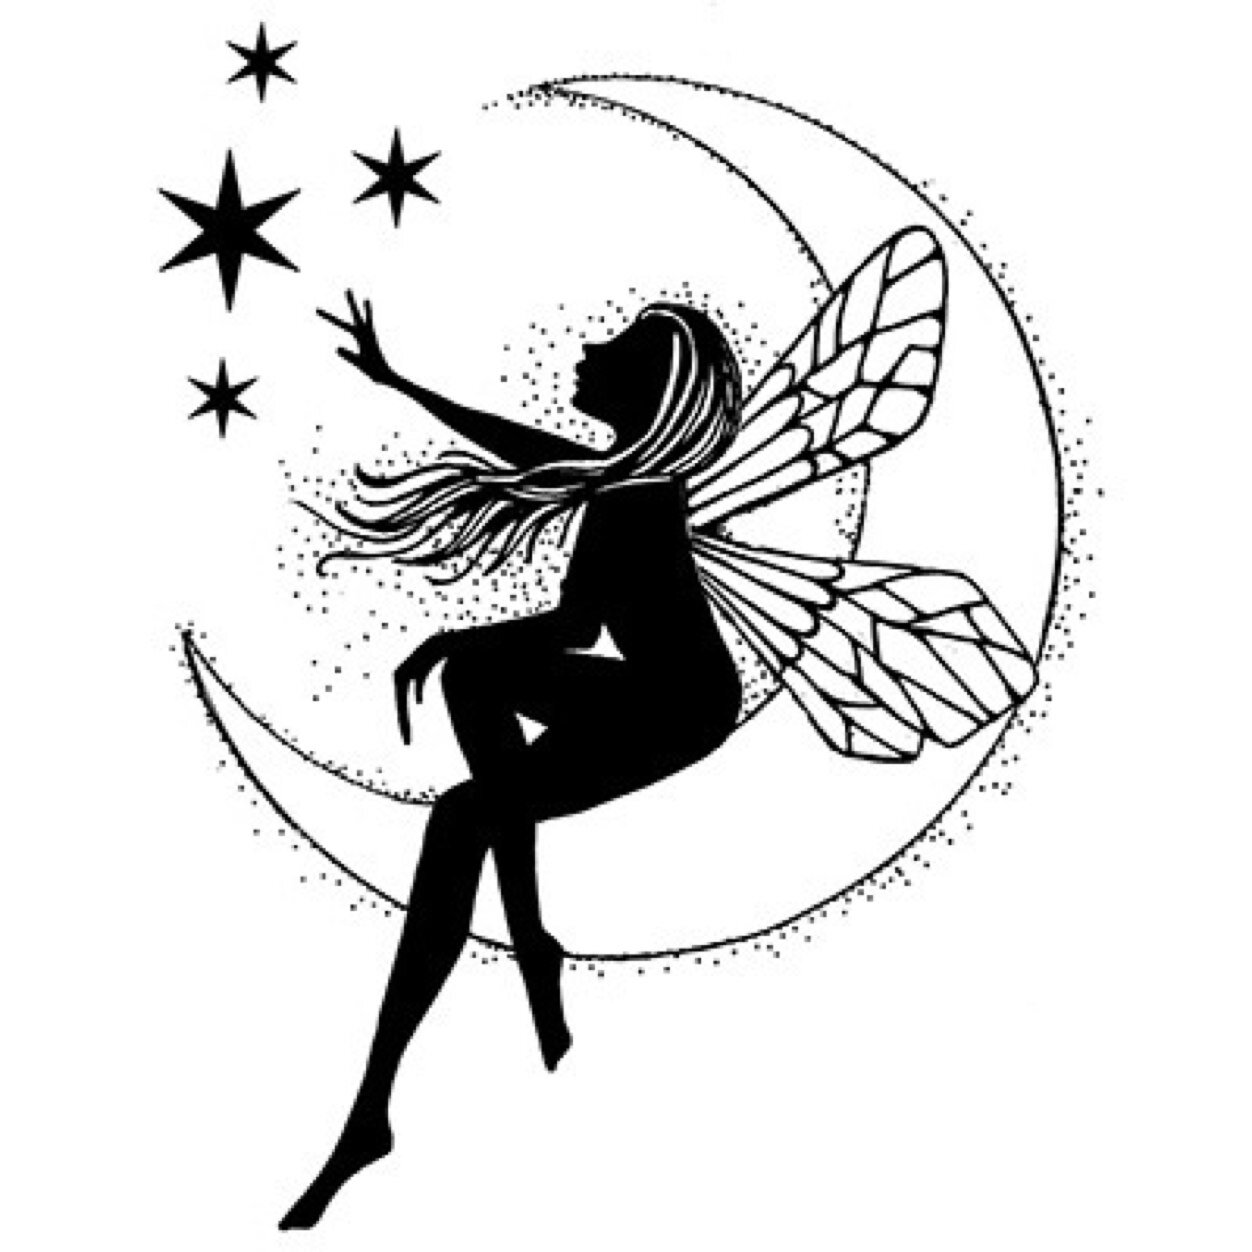 19 fairy with stars tattoos ideas